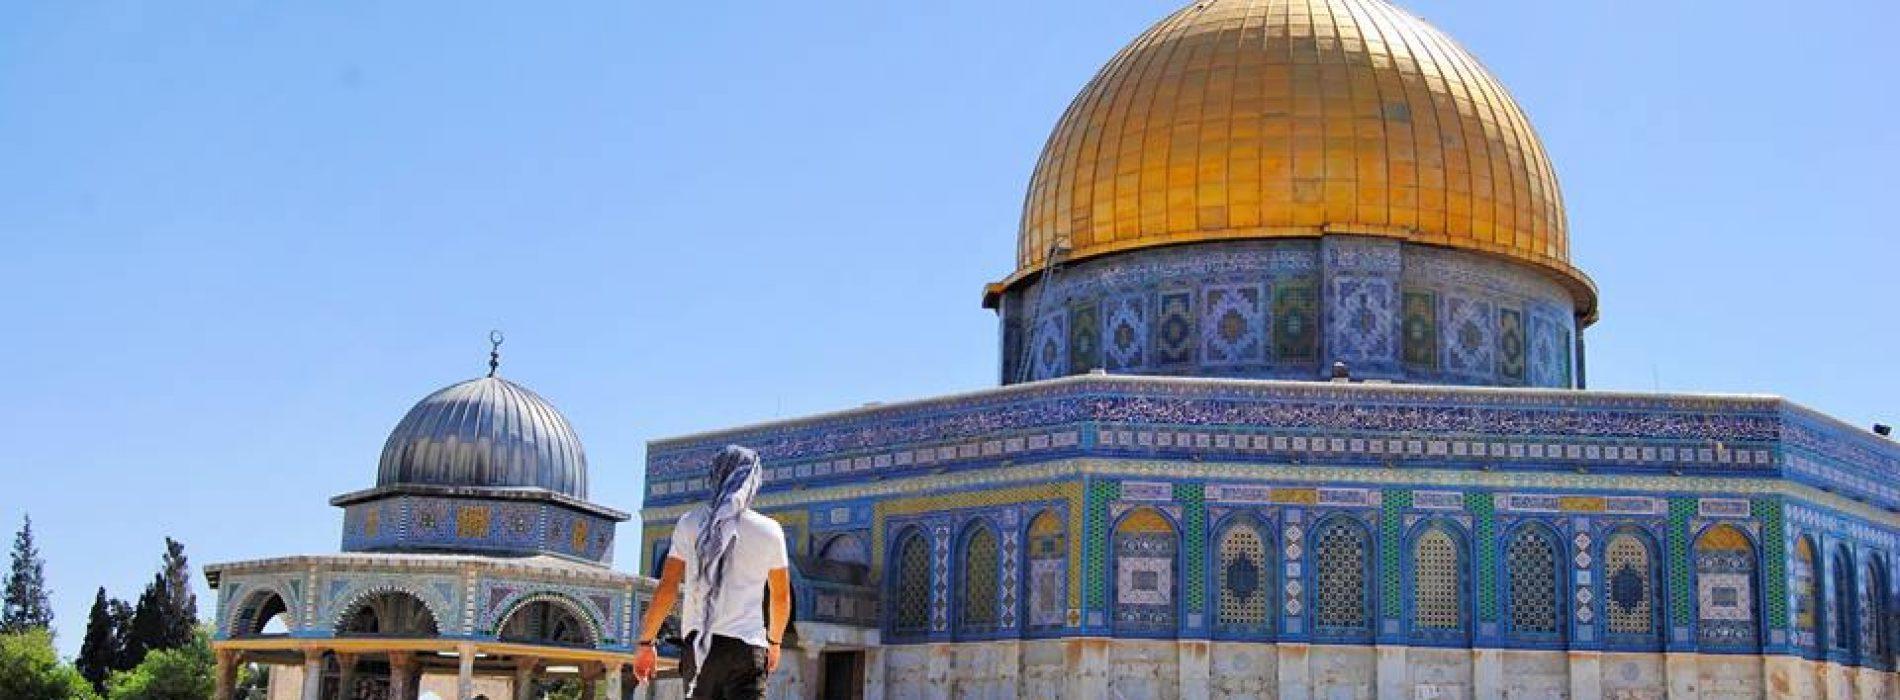 Filistin'i bisiklet ile gezmek